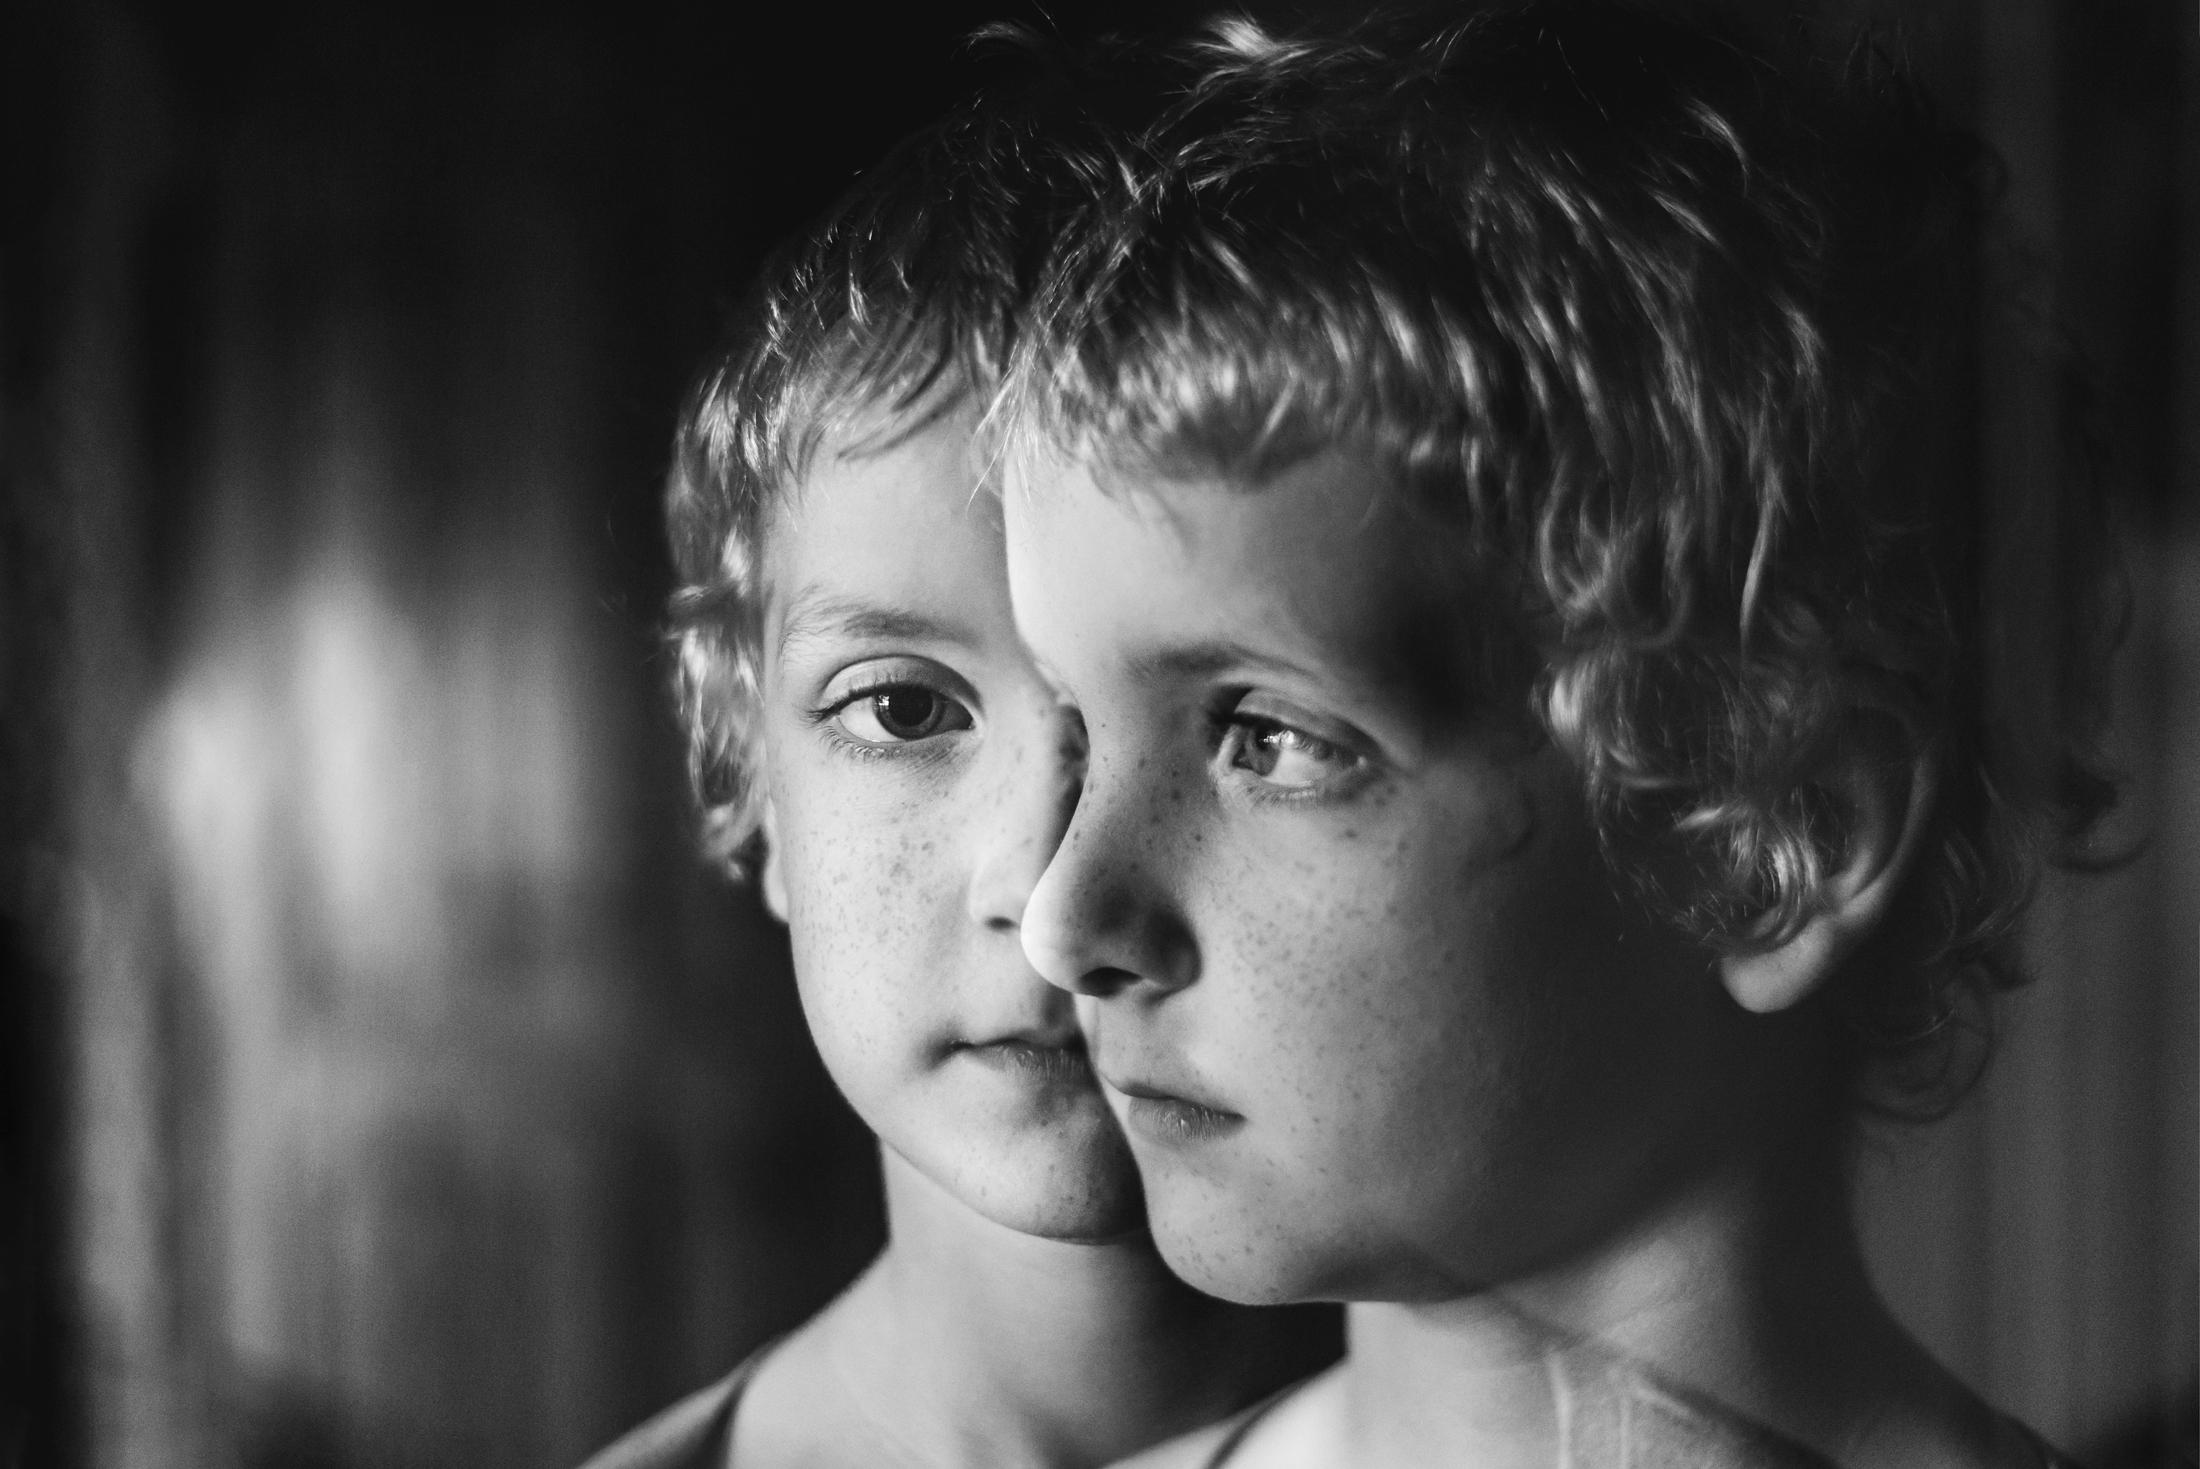 Double exposure portrait of boy